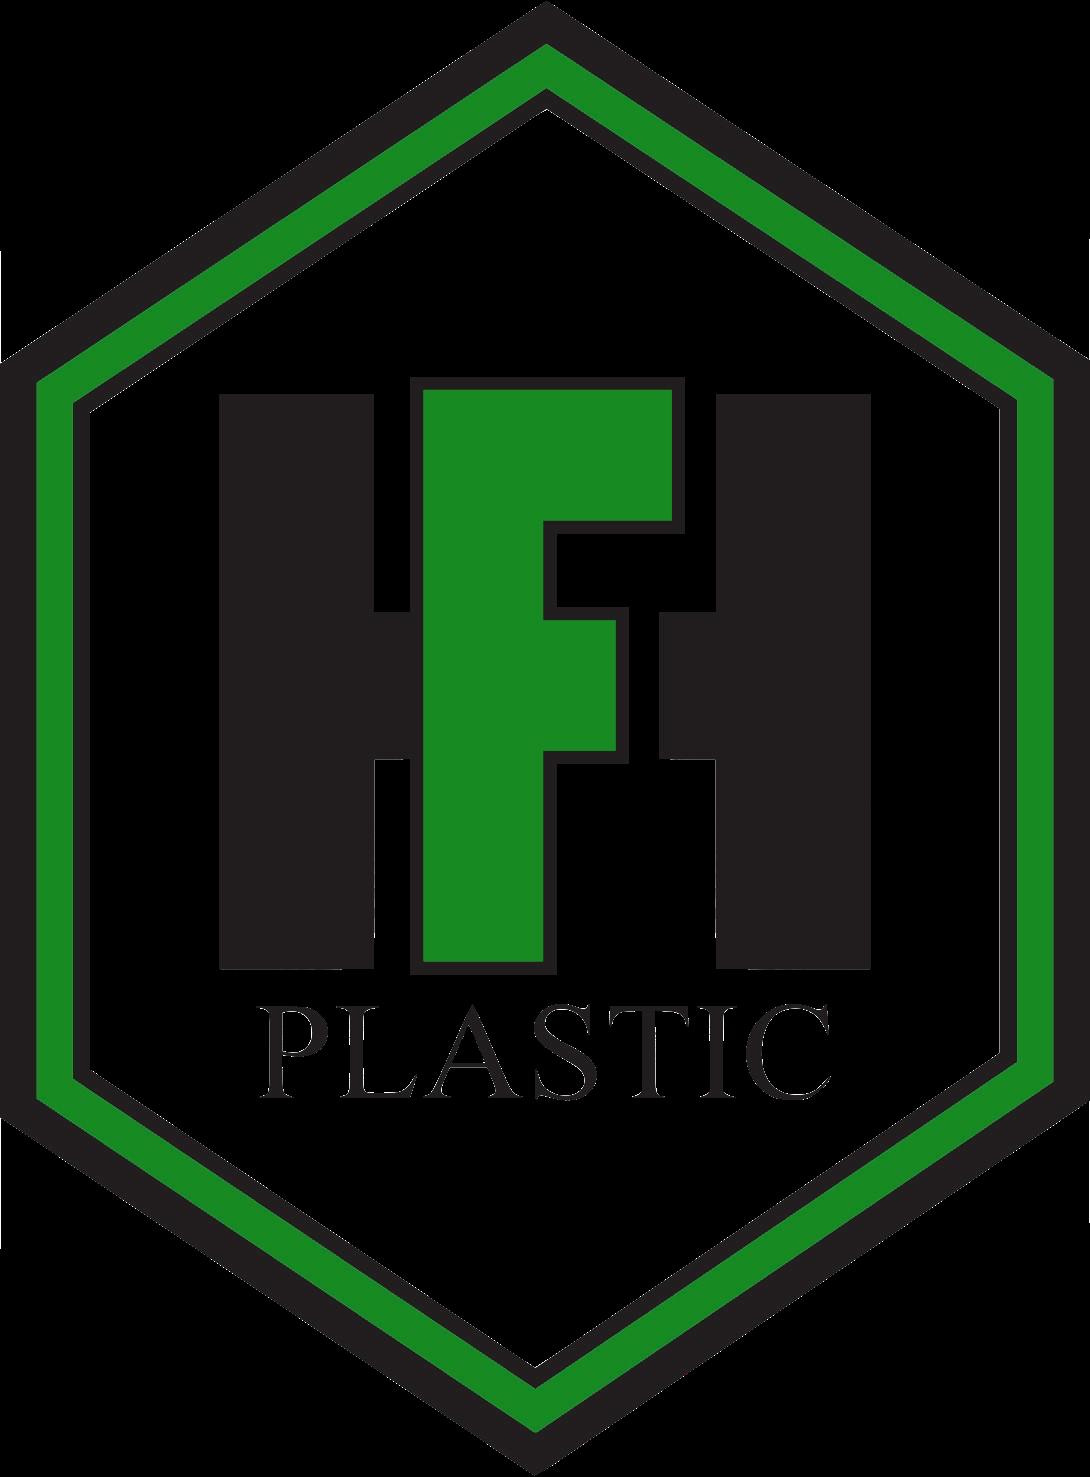 Hyma Plastic Hyma Foom logo